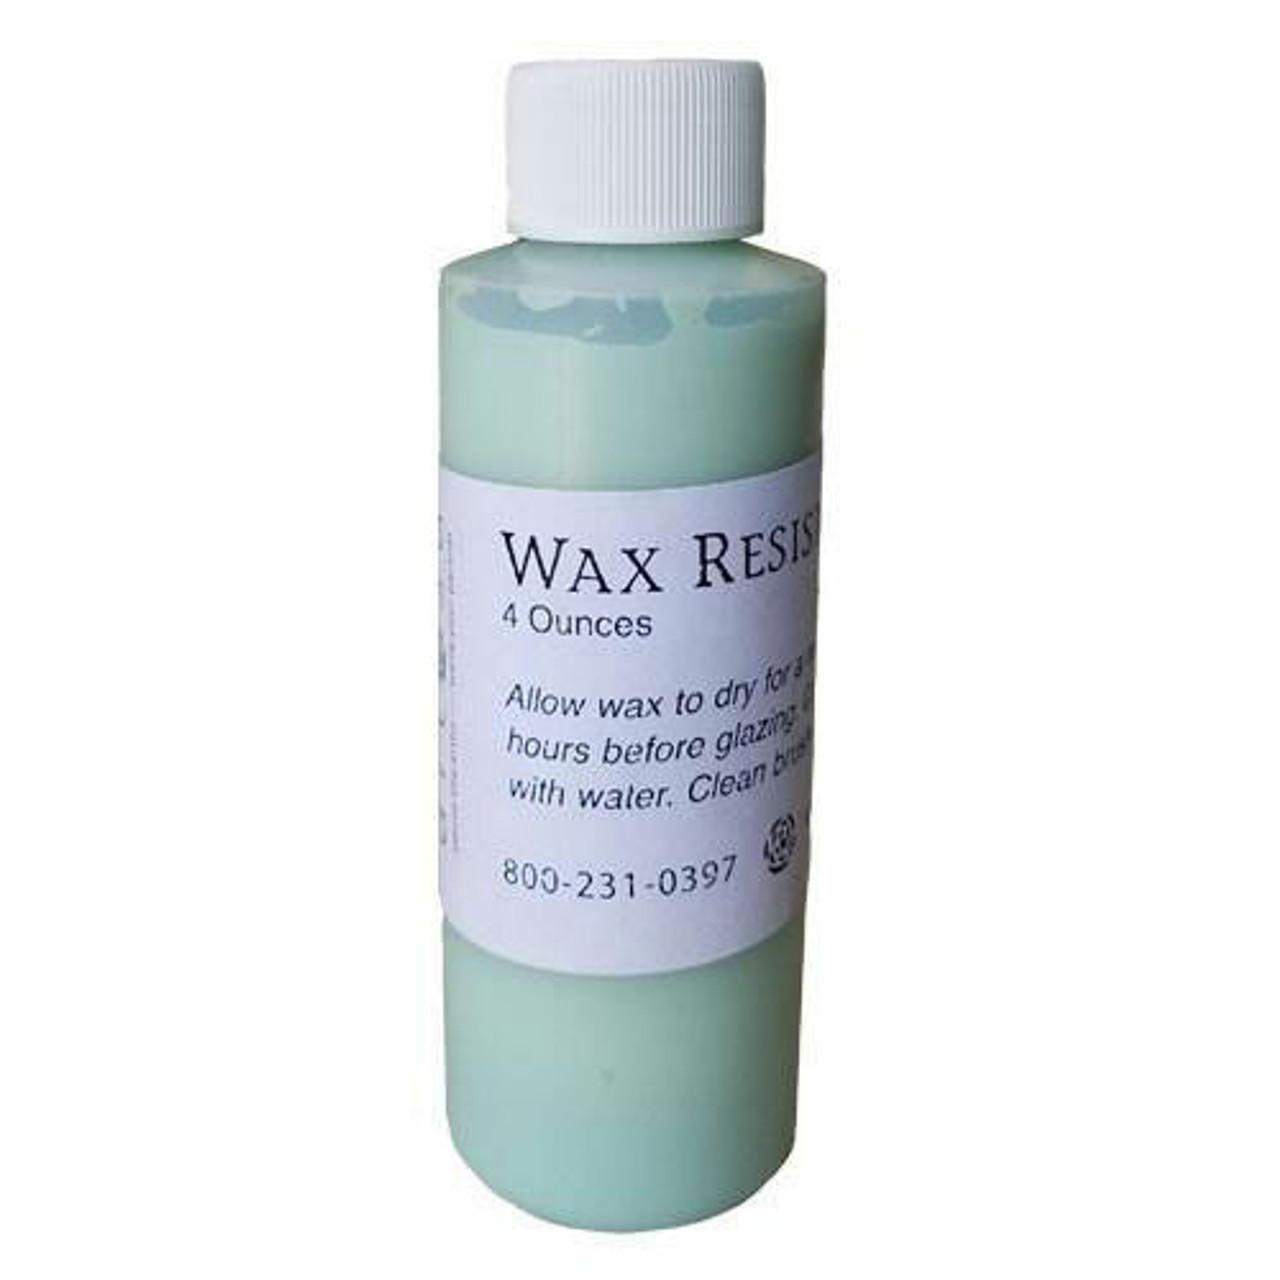 4 ounce wax resist from AFTOSA